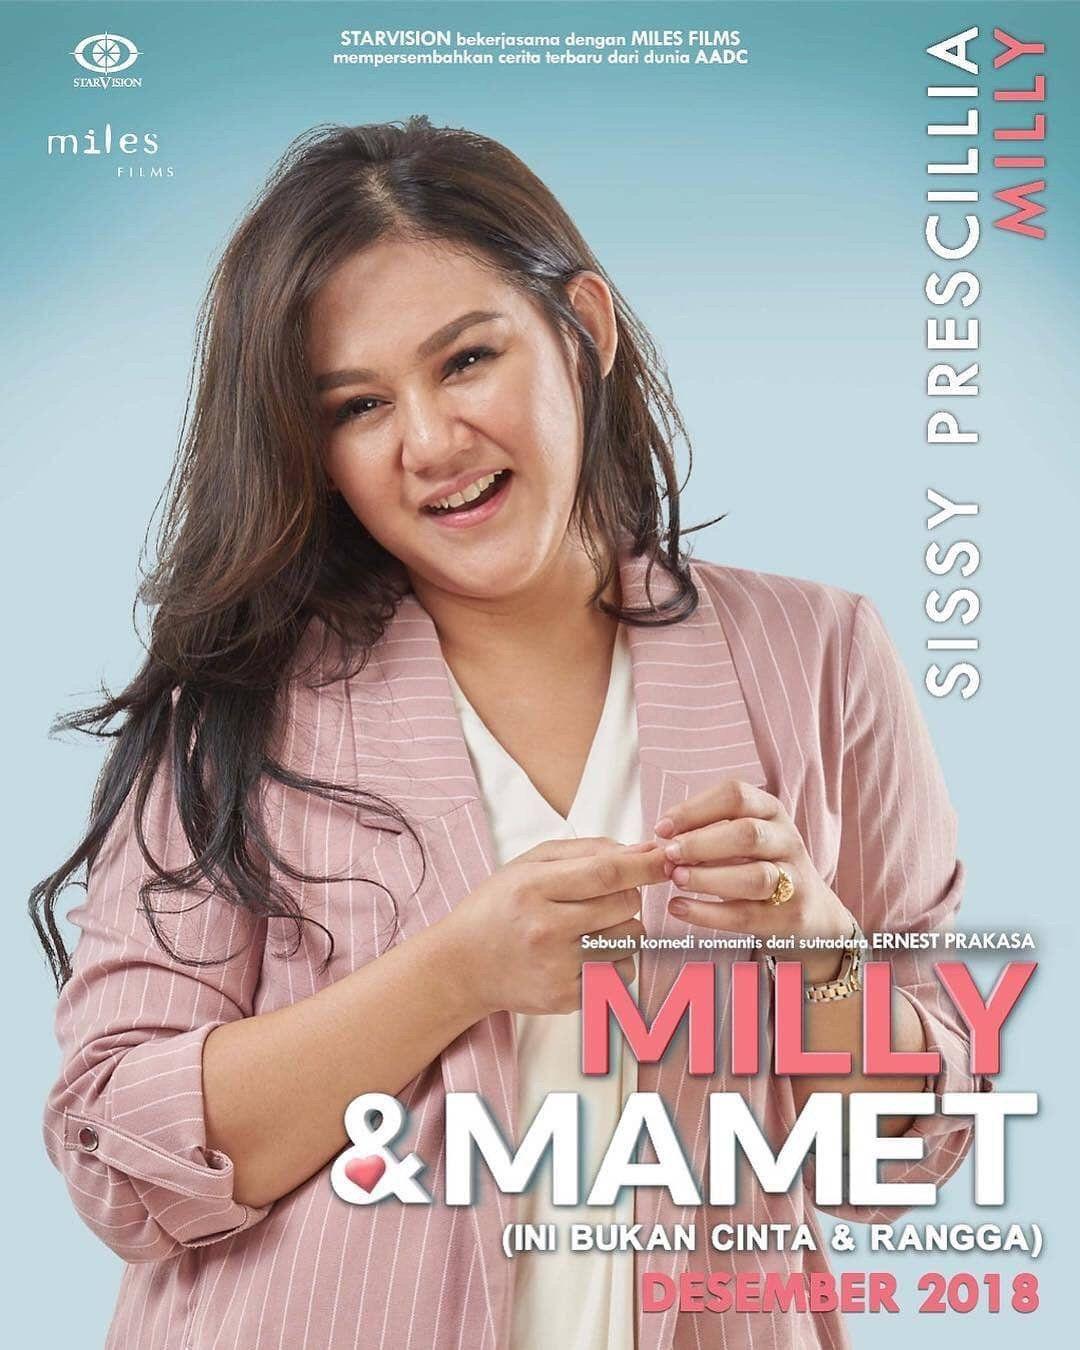 Image result for milly dan mamet poster